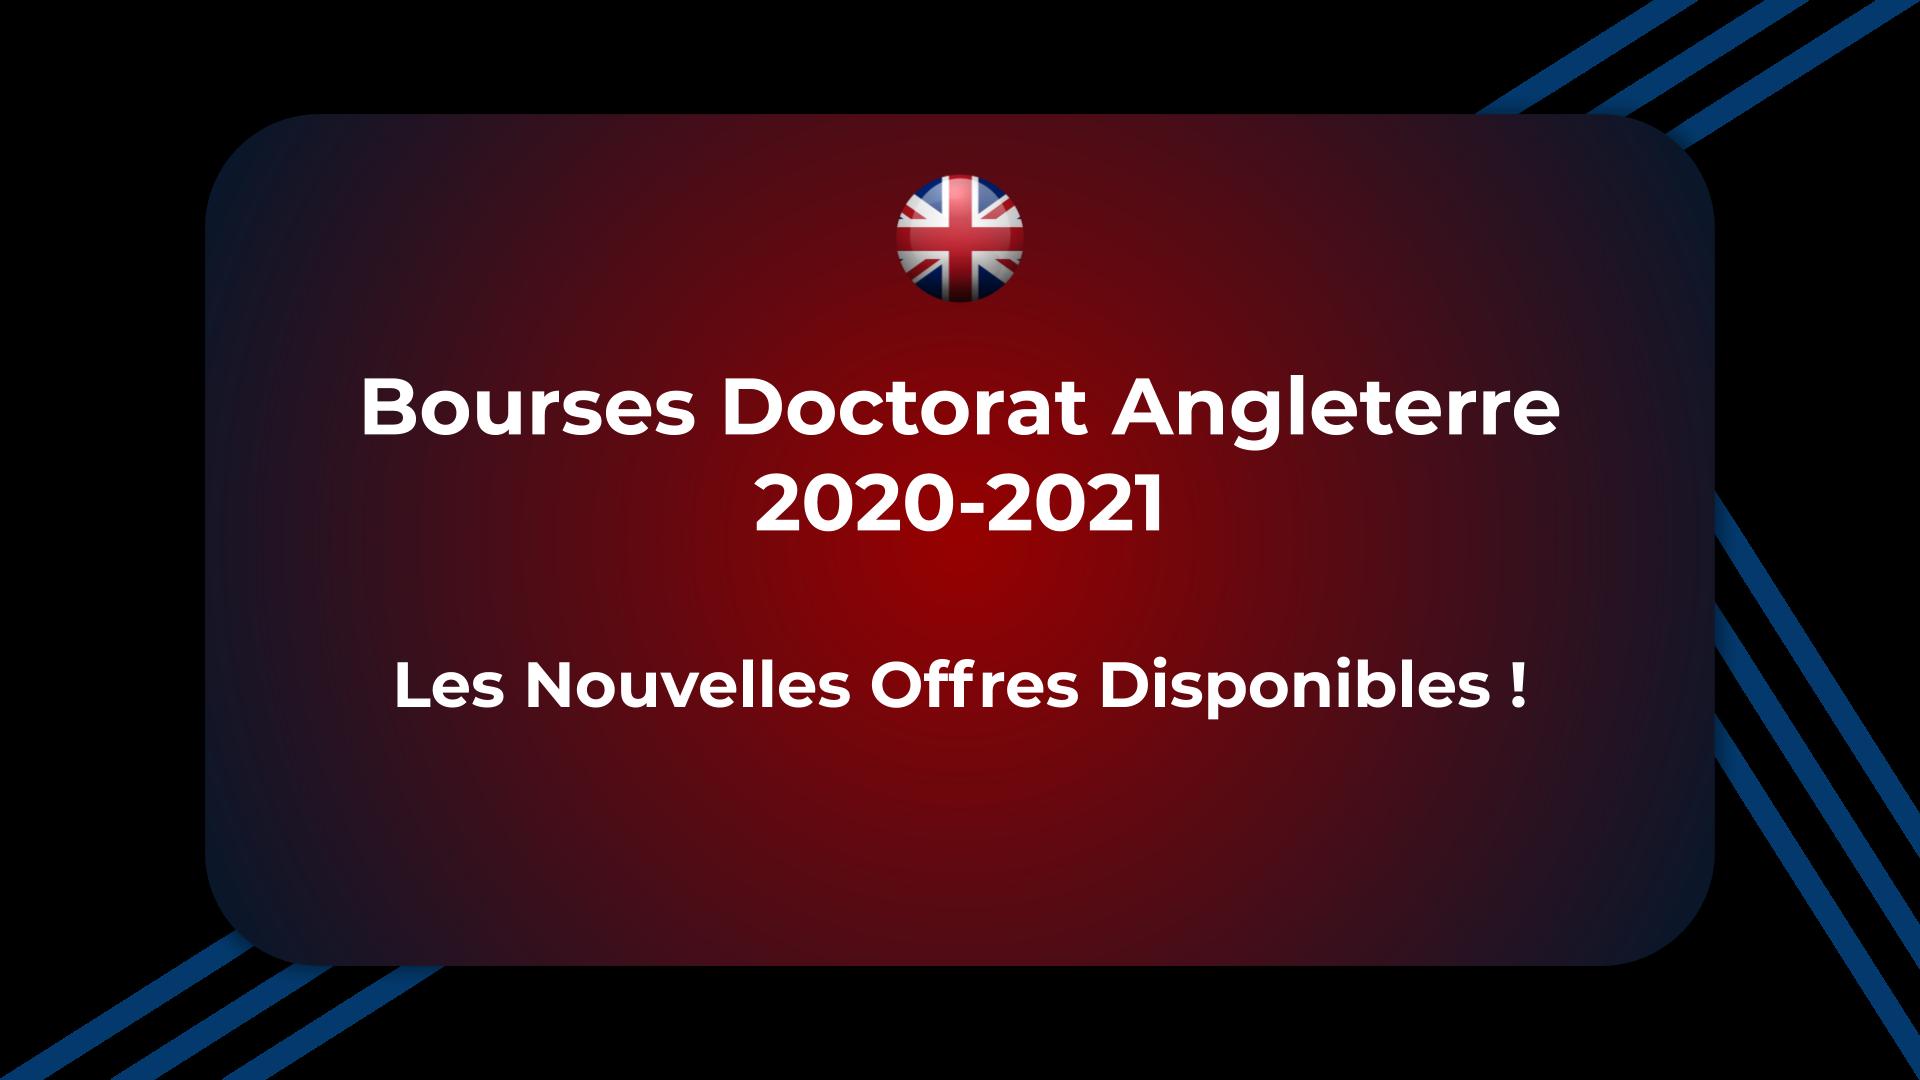 Bourses Doctorat Angleterre 2020-2021 - Les Offres Disponibles !